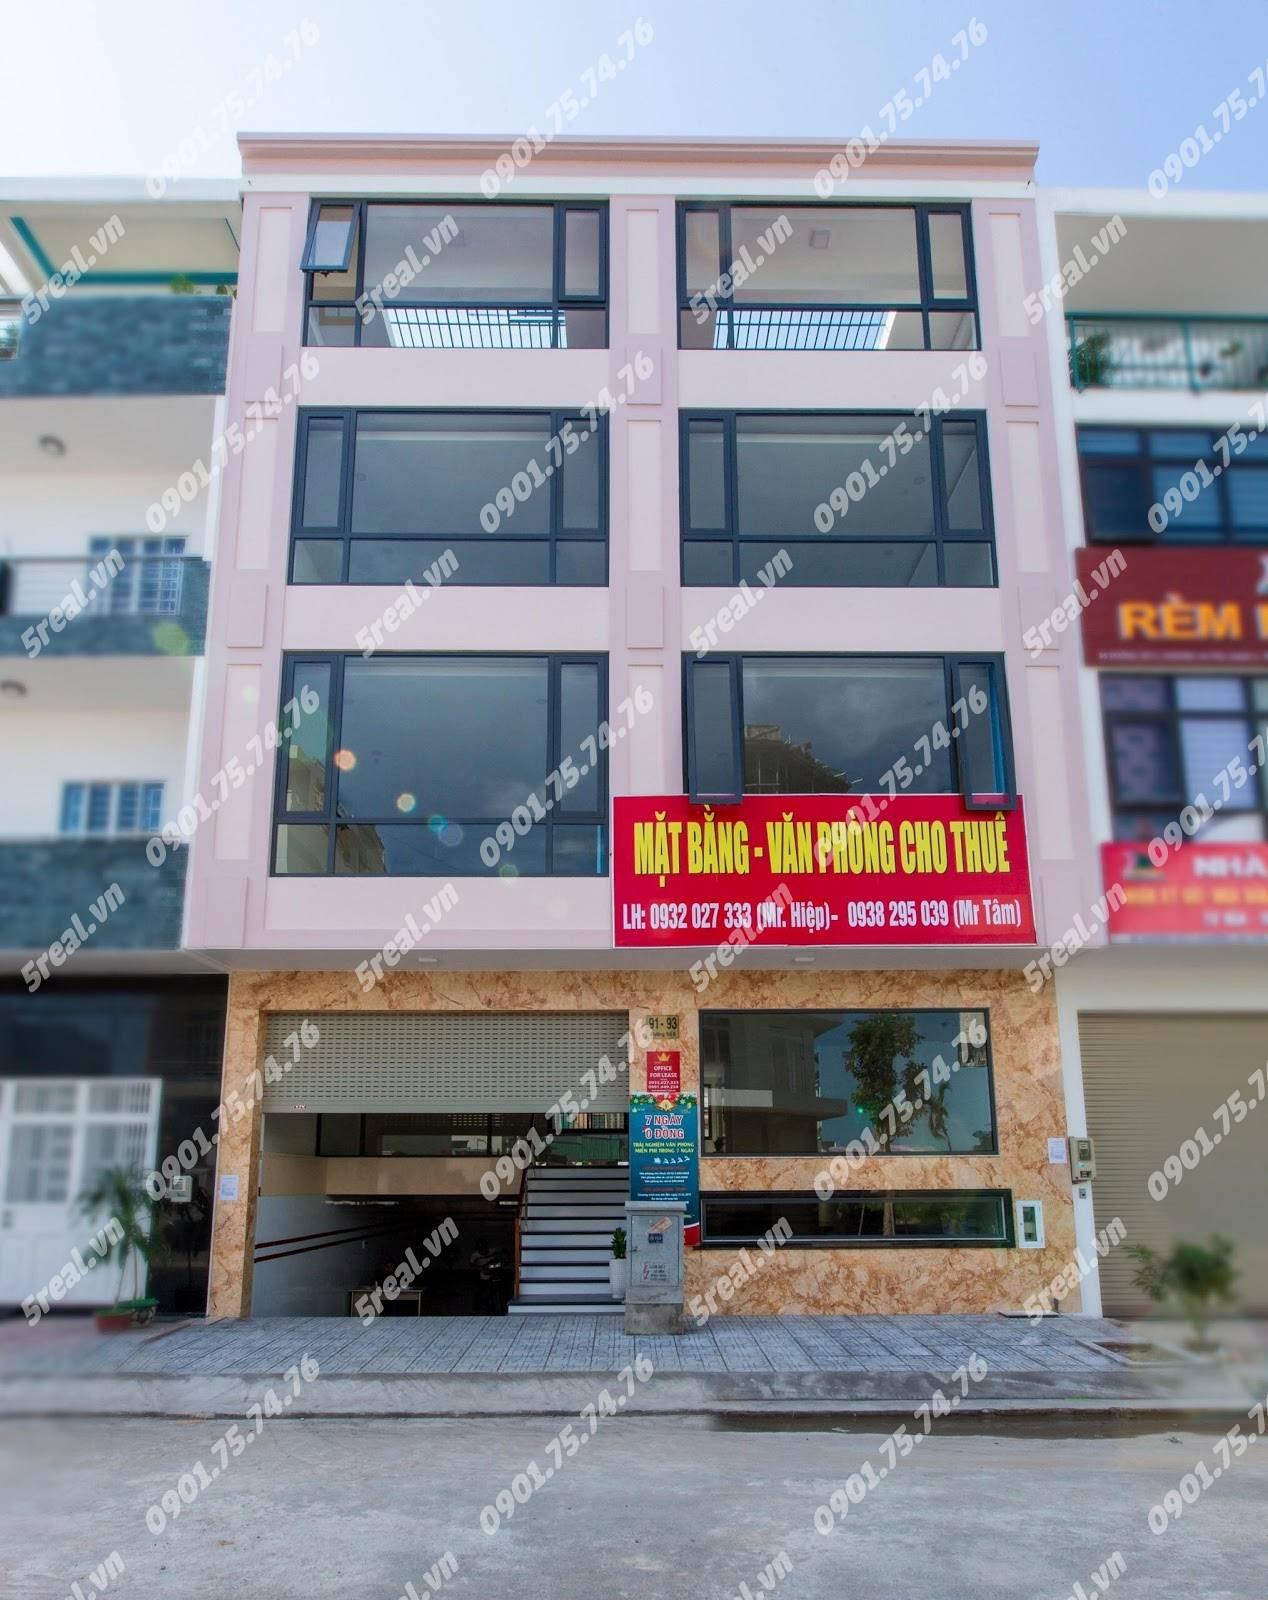 win-home-duong-so-5-quan-2-van-phong-cho-thue-5real.vn-01